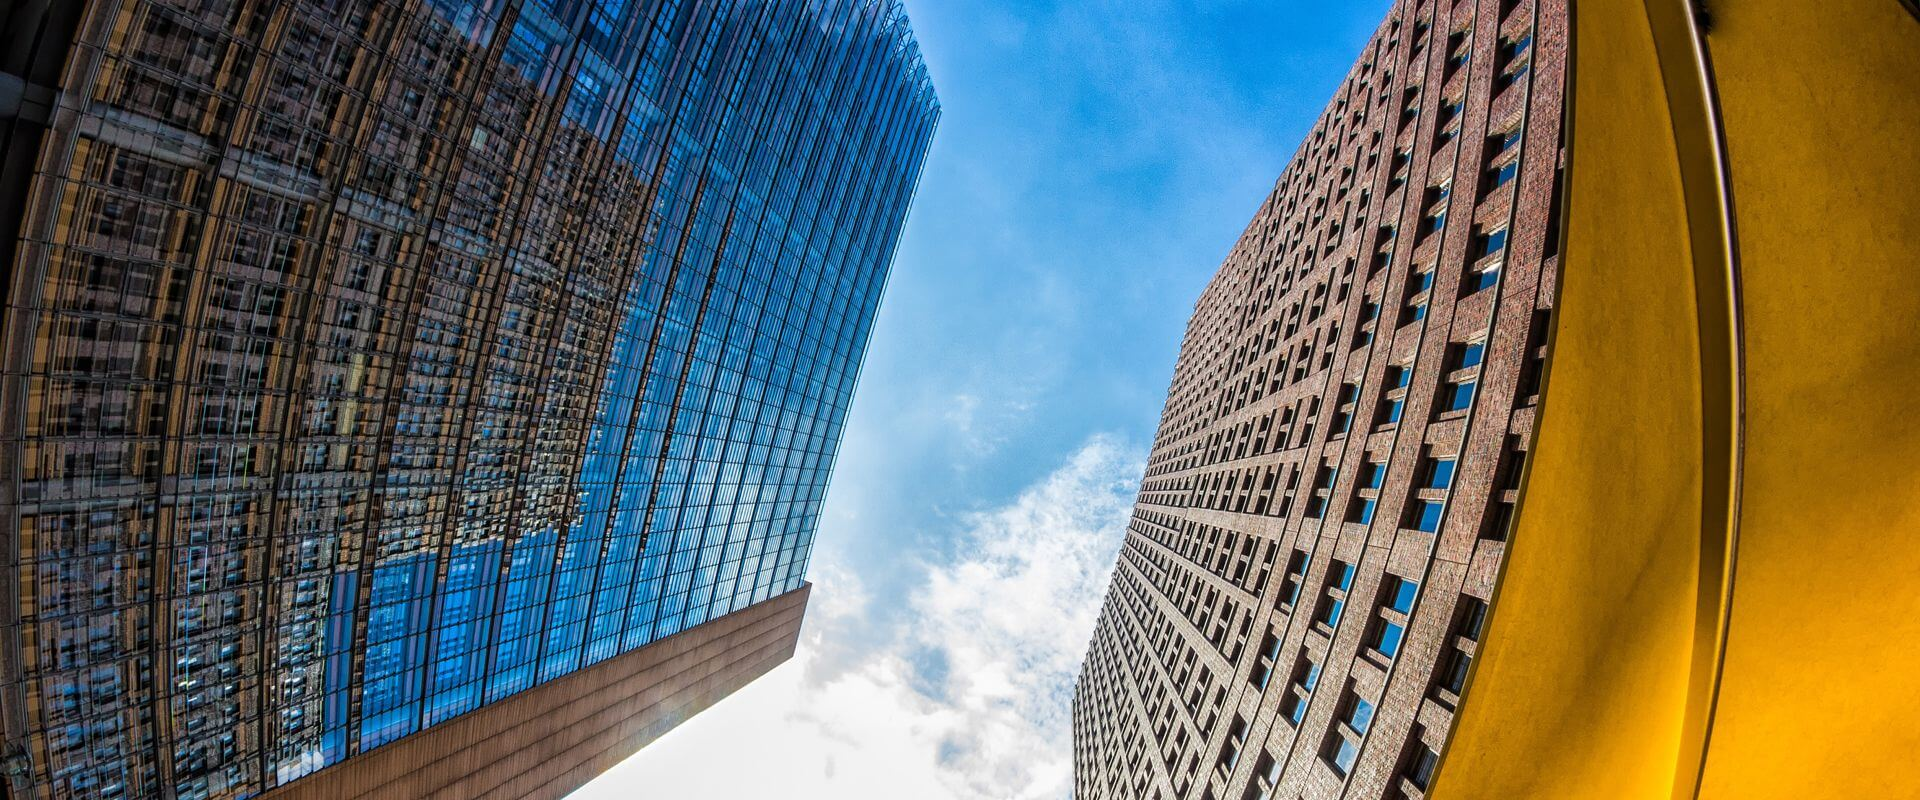 bee-smart-city-blog-smart-strategy.jpg